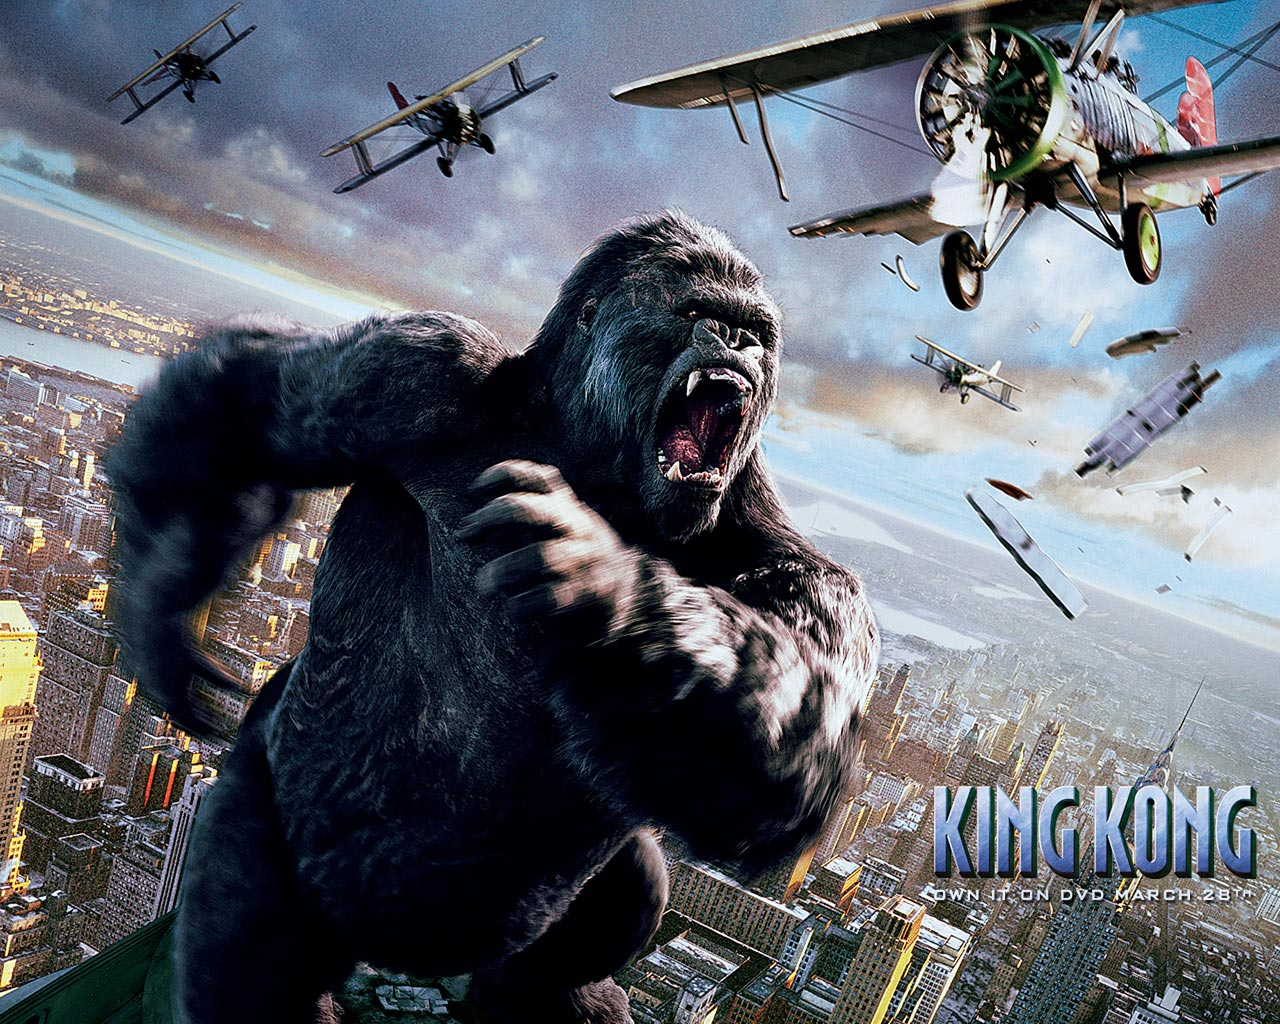 king kong 2005 full movie in hindi free download 300mb